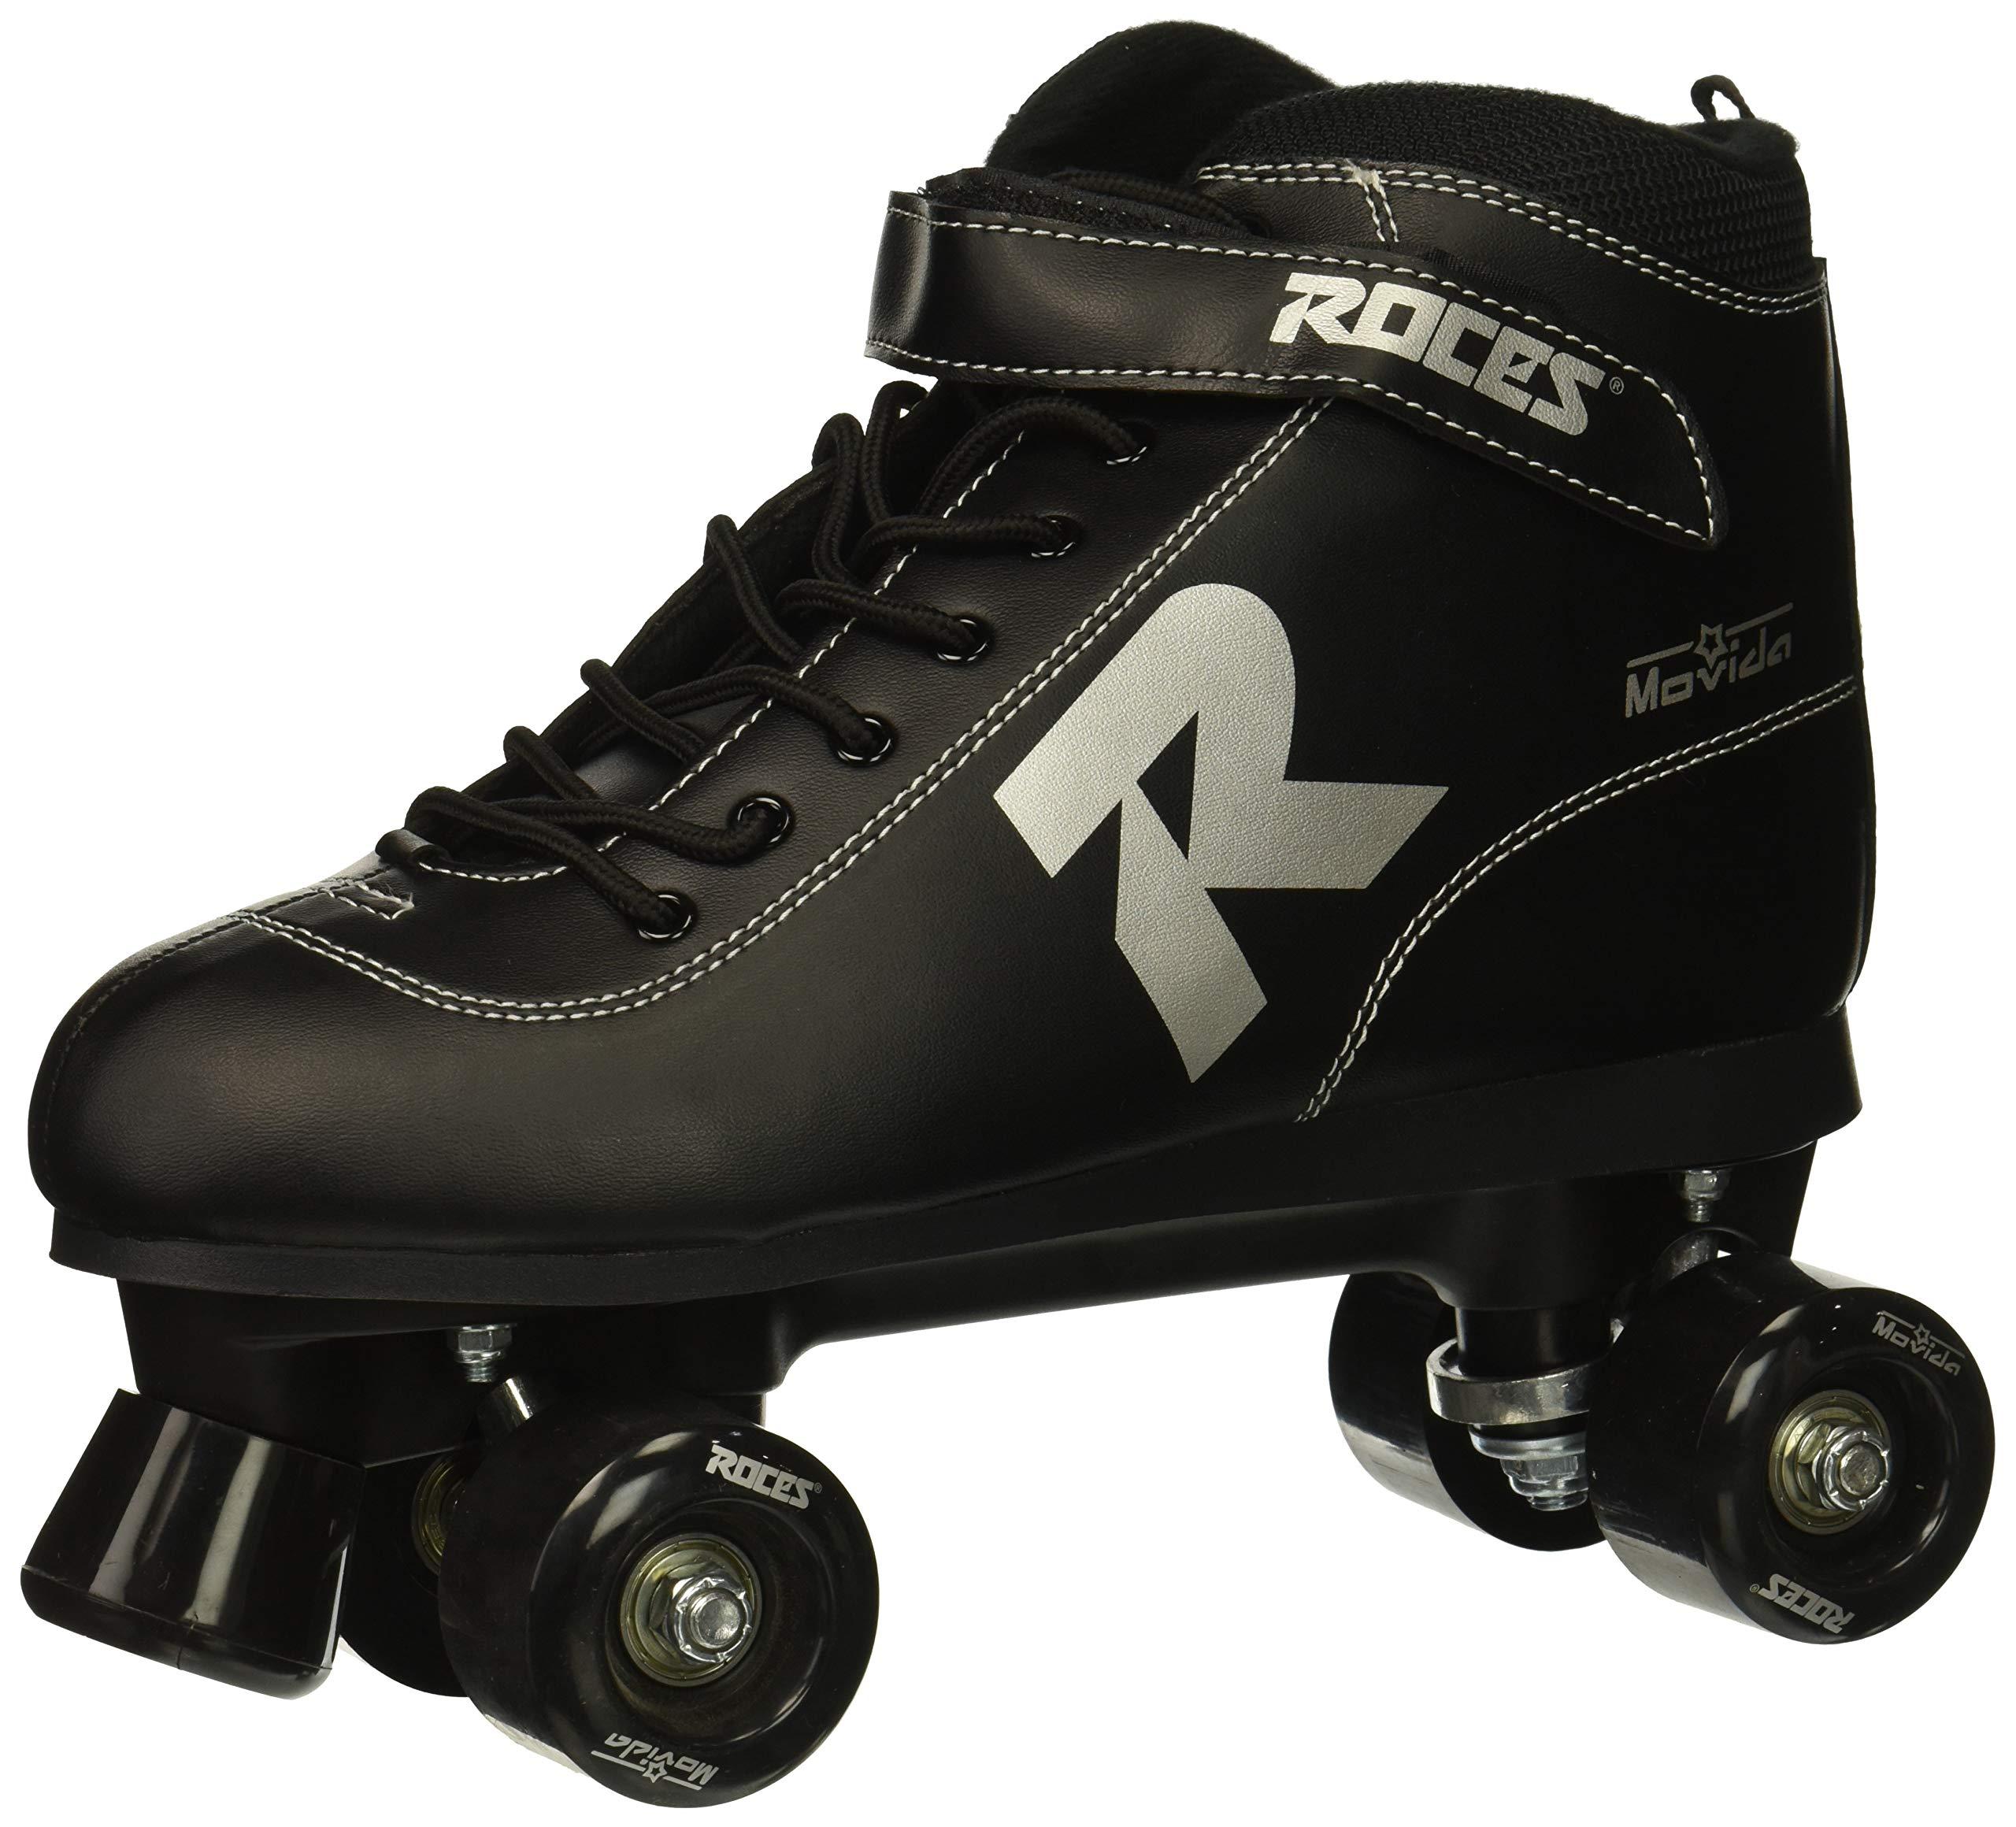 Roces 550068 Model Movida UP Roller Skate, US 9M/11W, Black